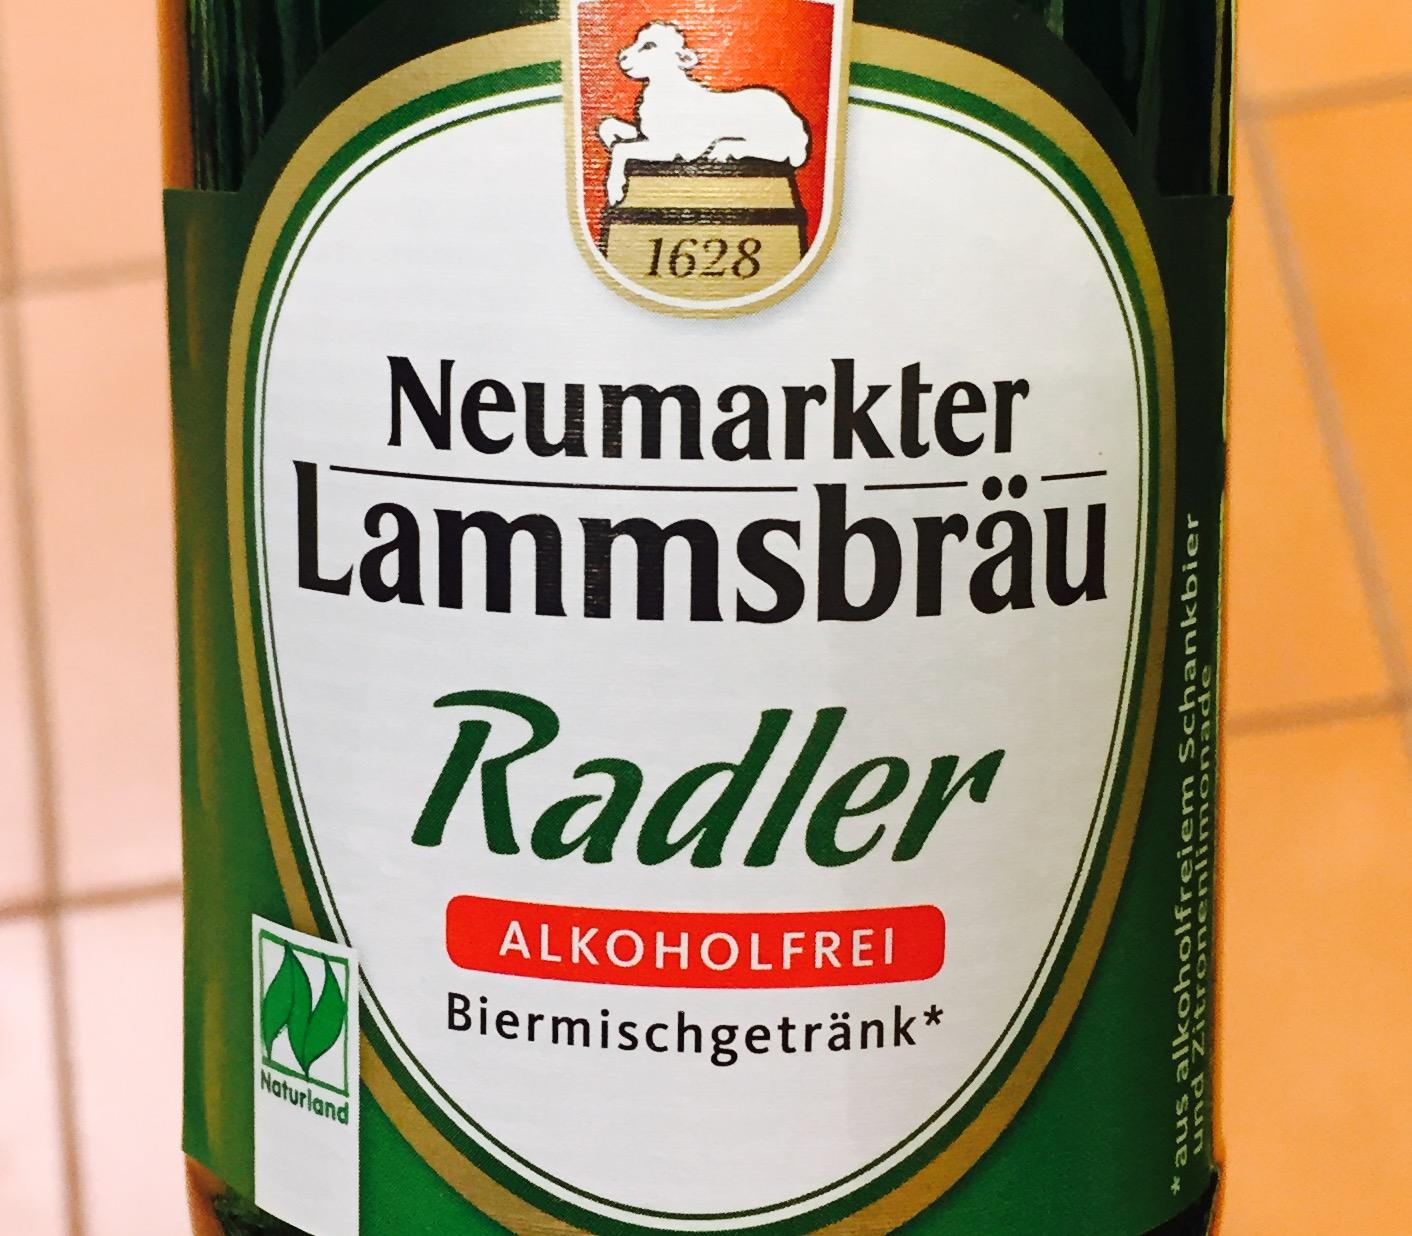 Neumarkter Lammsbräu - Radler Alkoholfrei